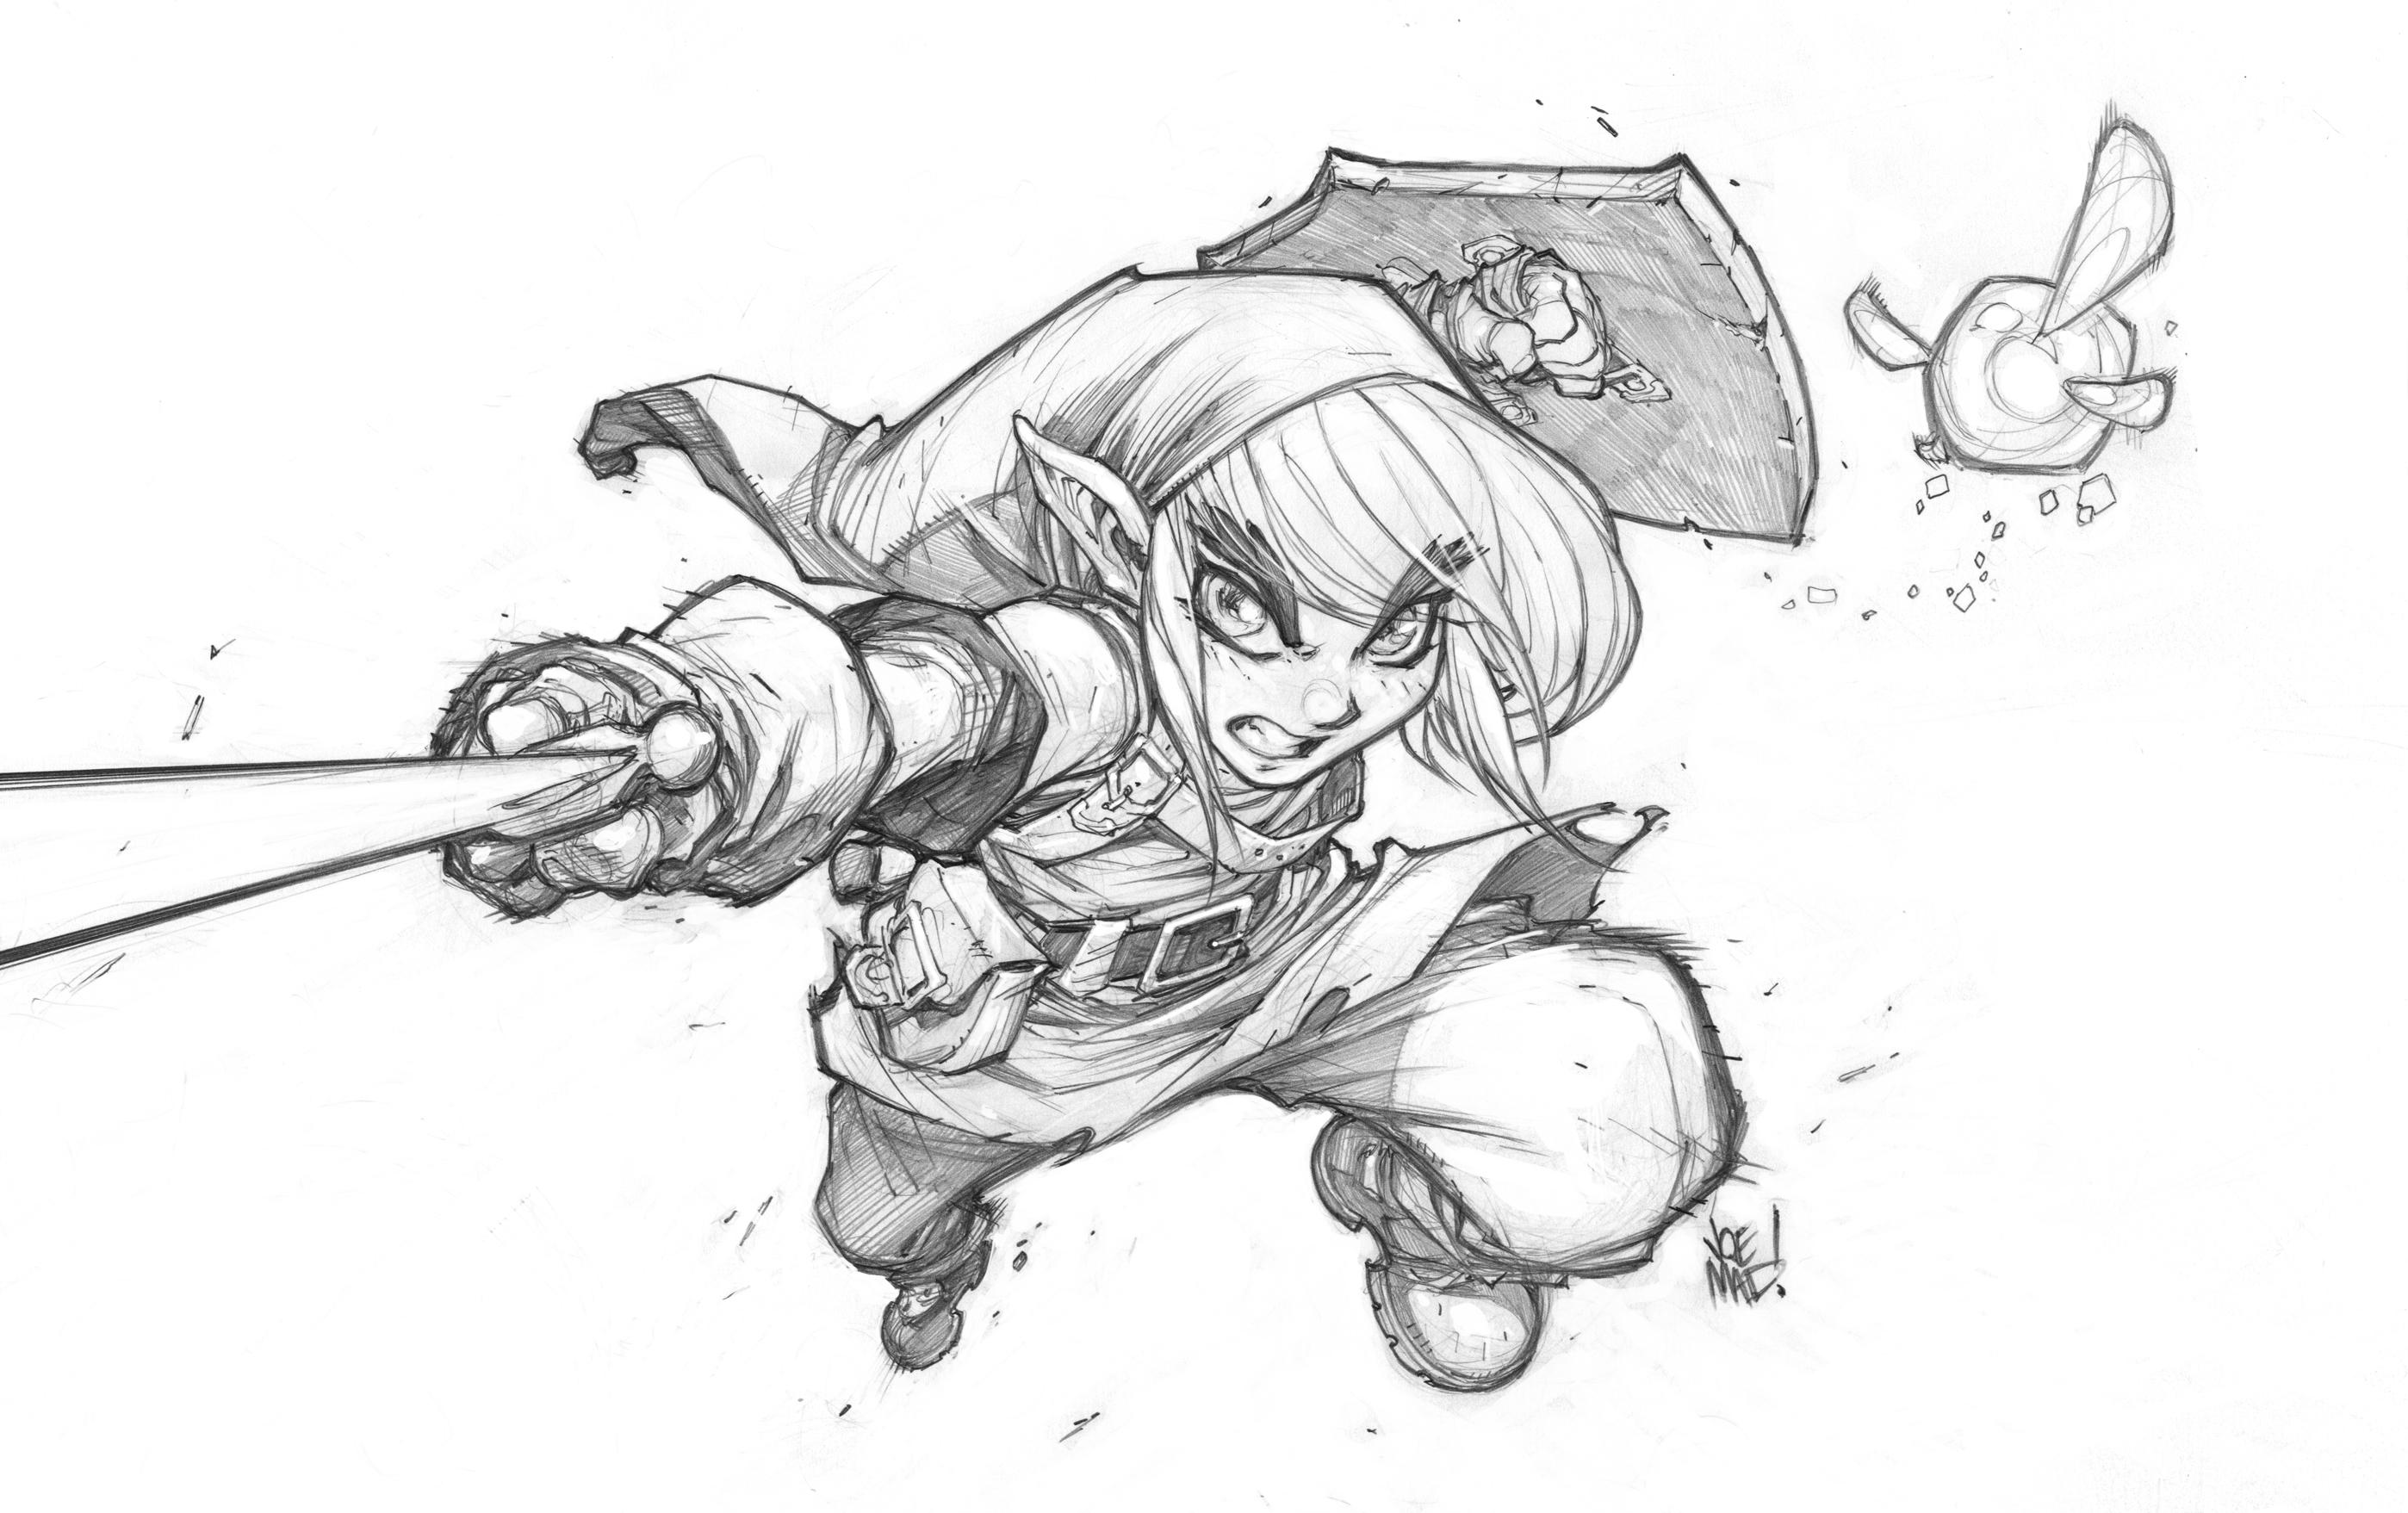 Line Art Comic : Zelda line art only by joemadx on deviantart